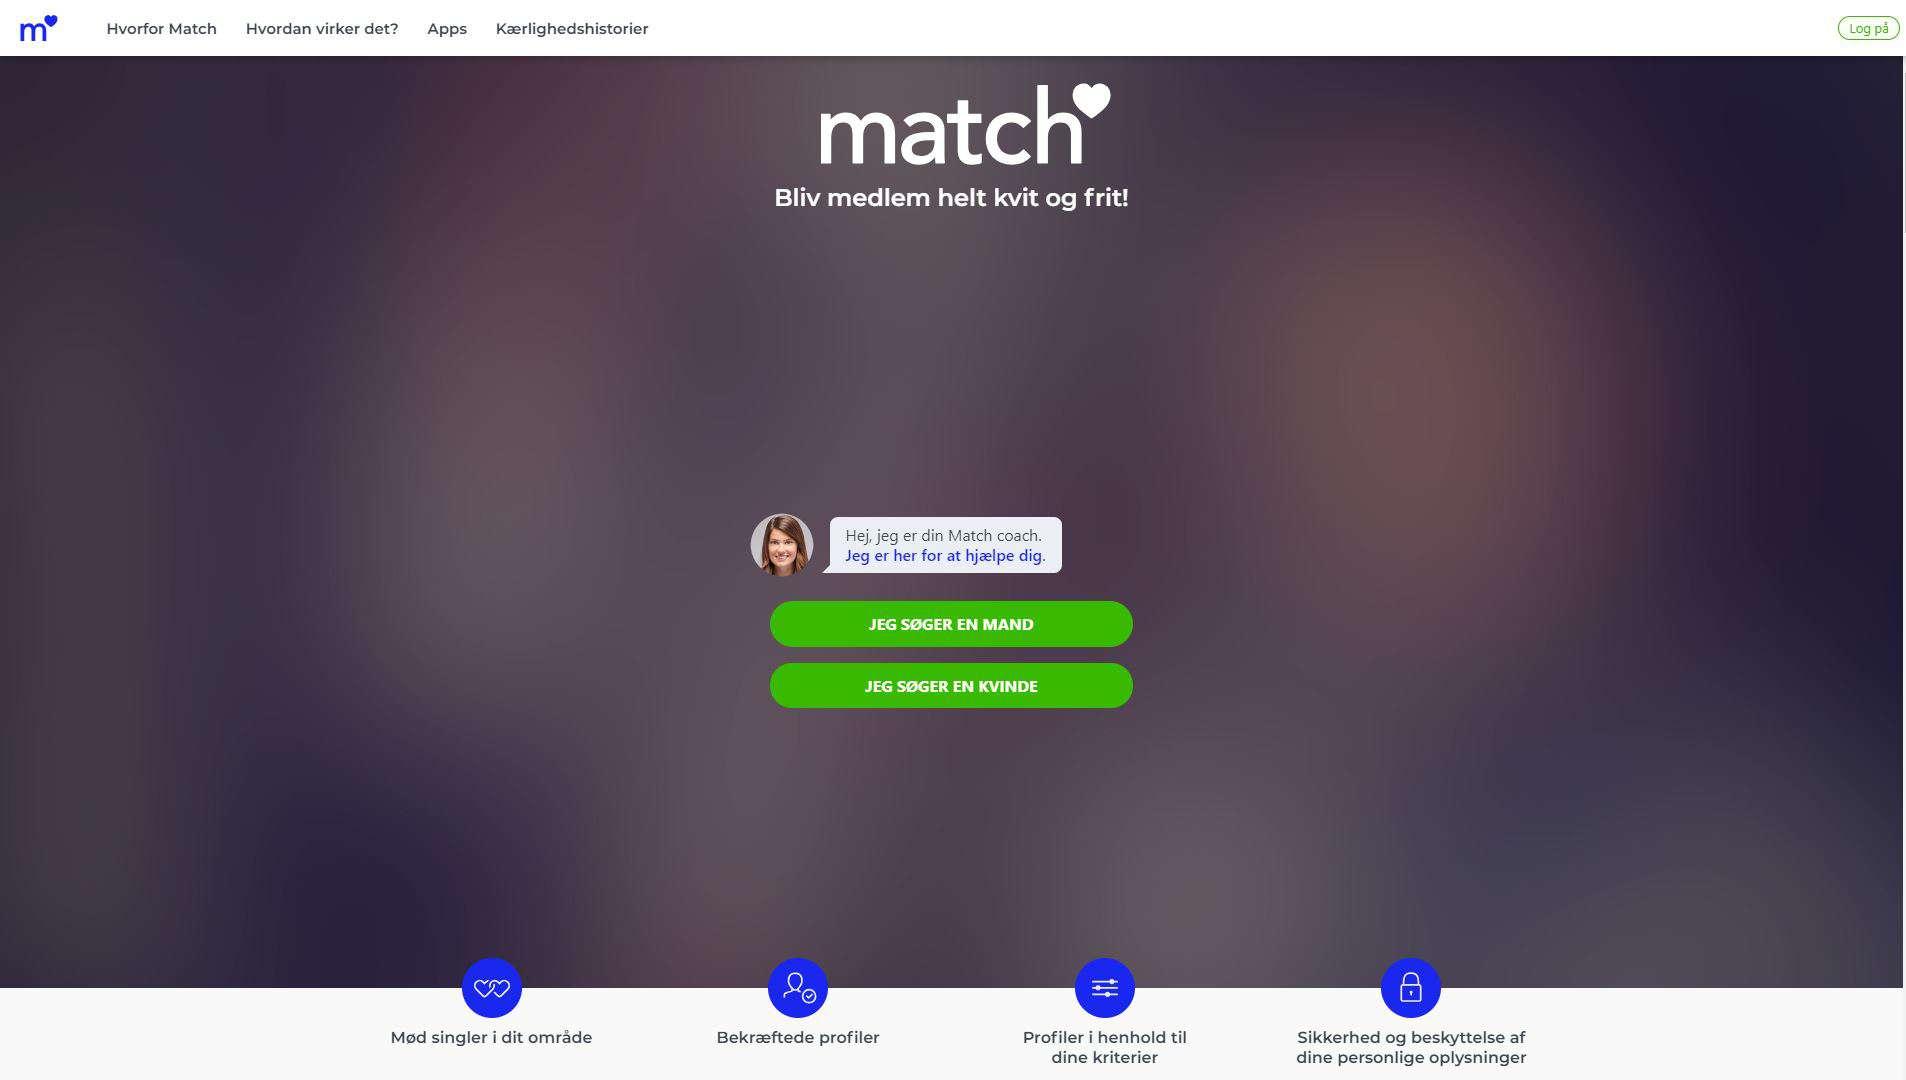 Hvad er den mest populære dating site for seniorer